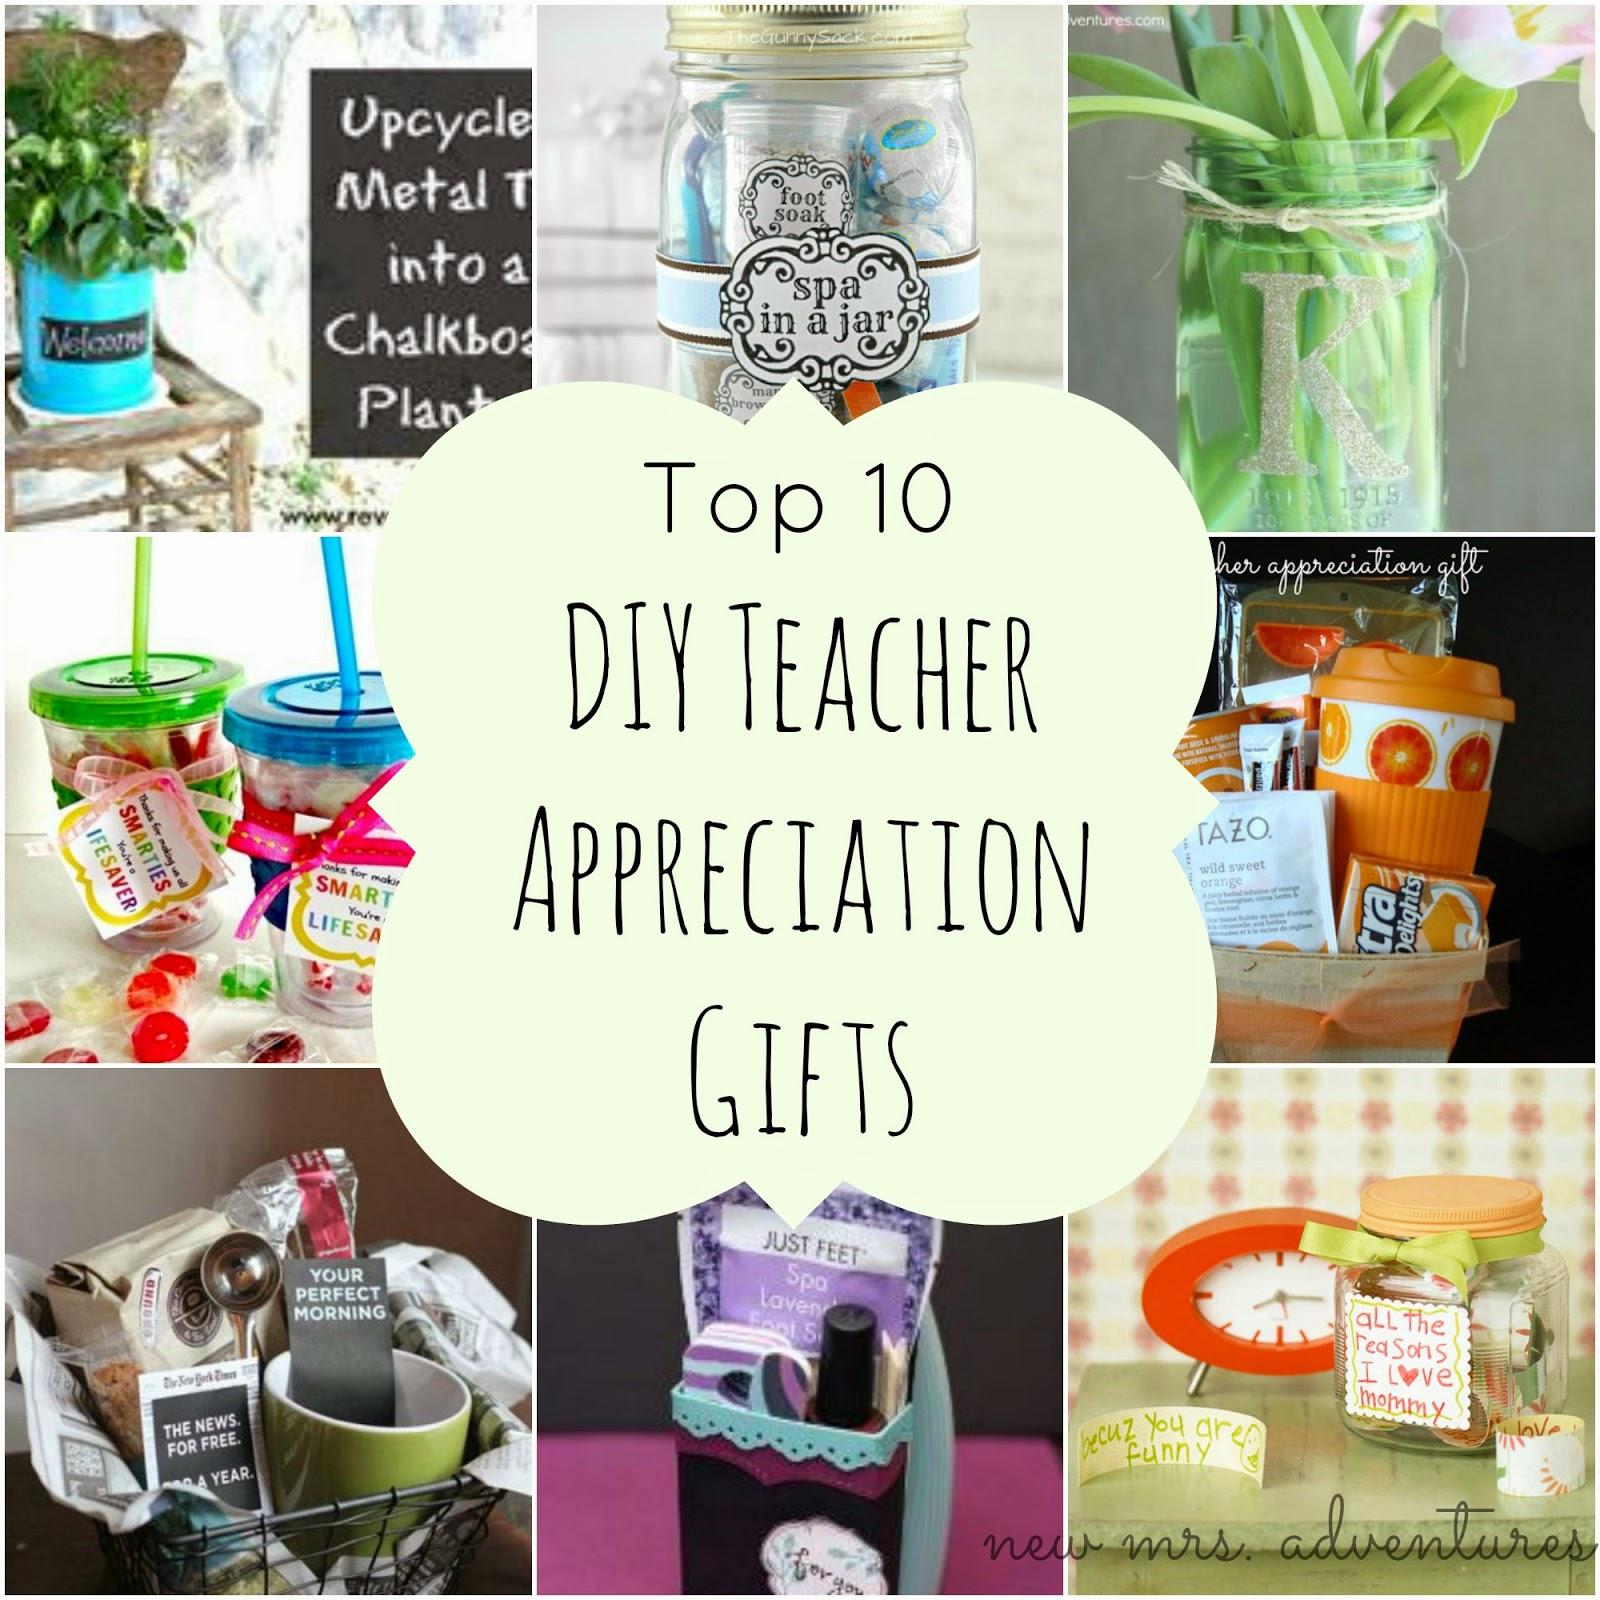 Barnabas Lane: Top 10 DIY Teacher Appreciation Gifts